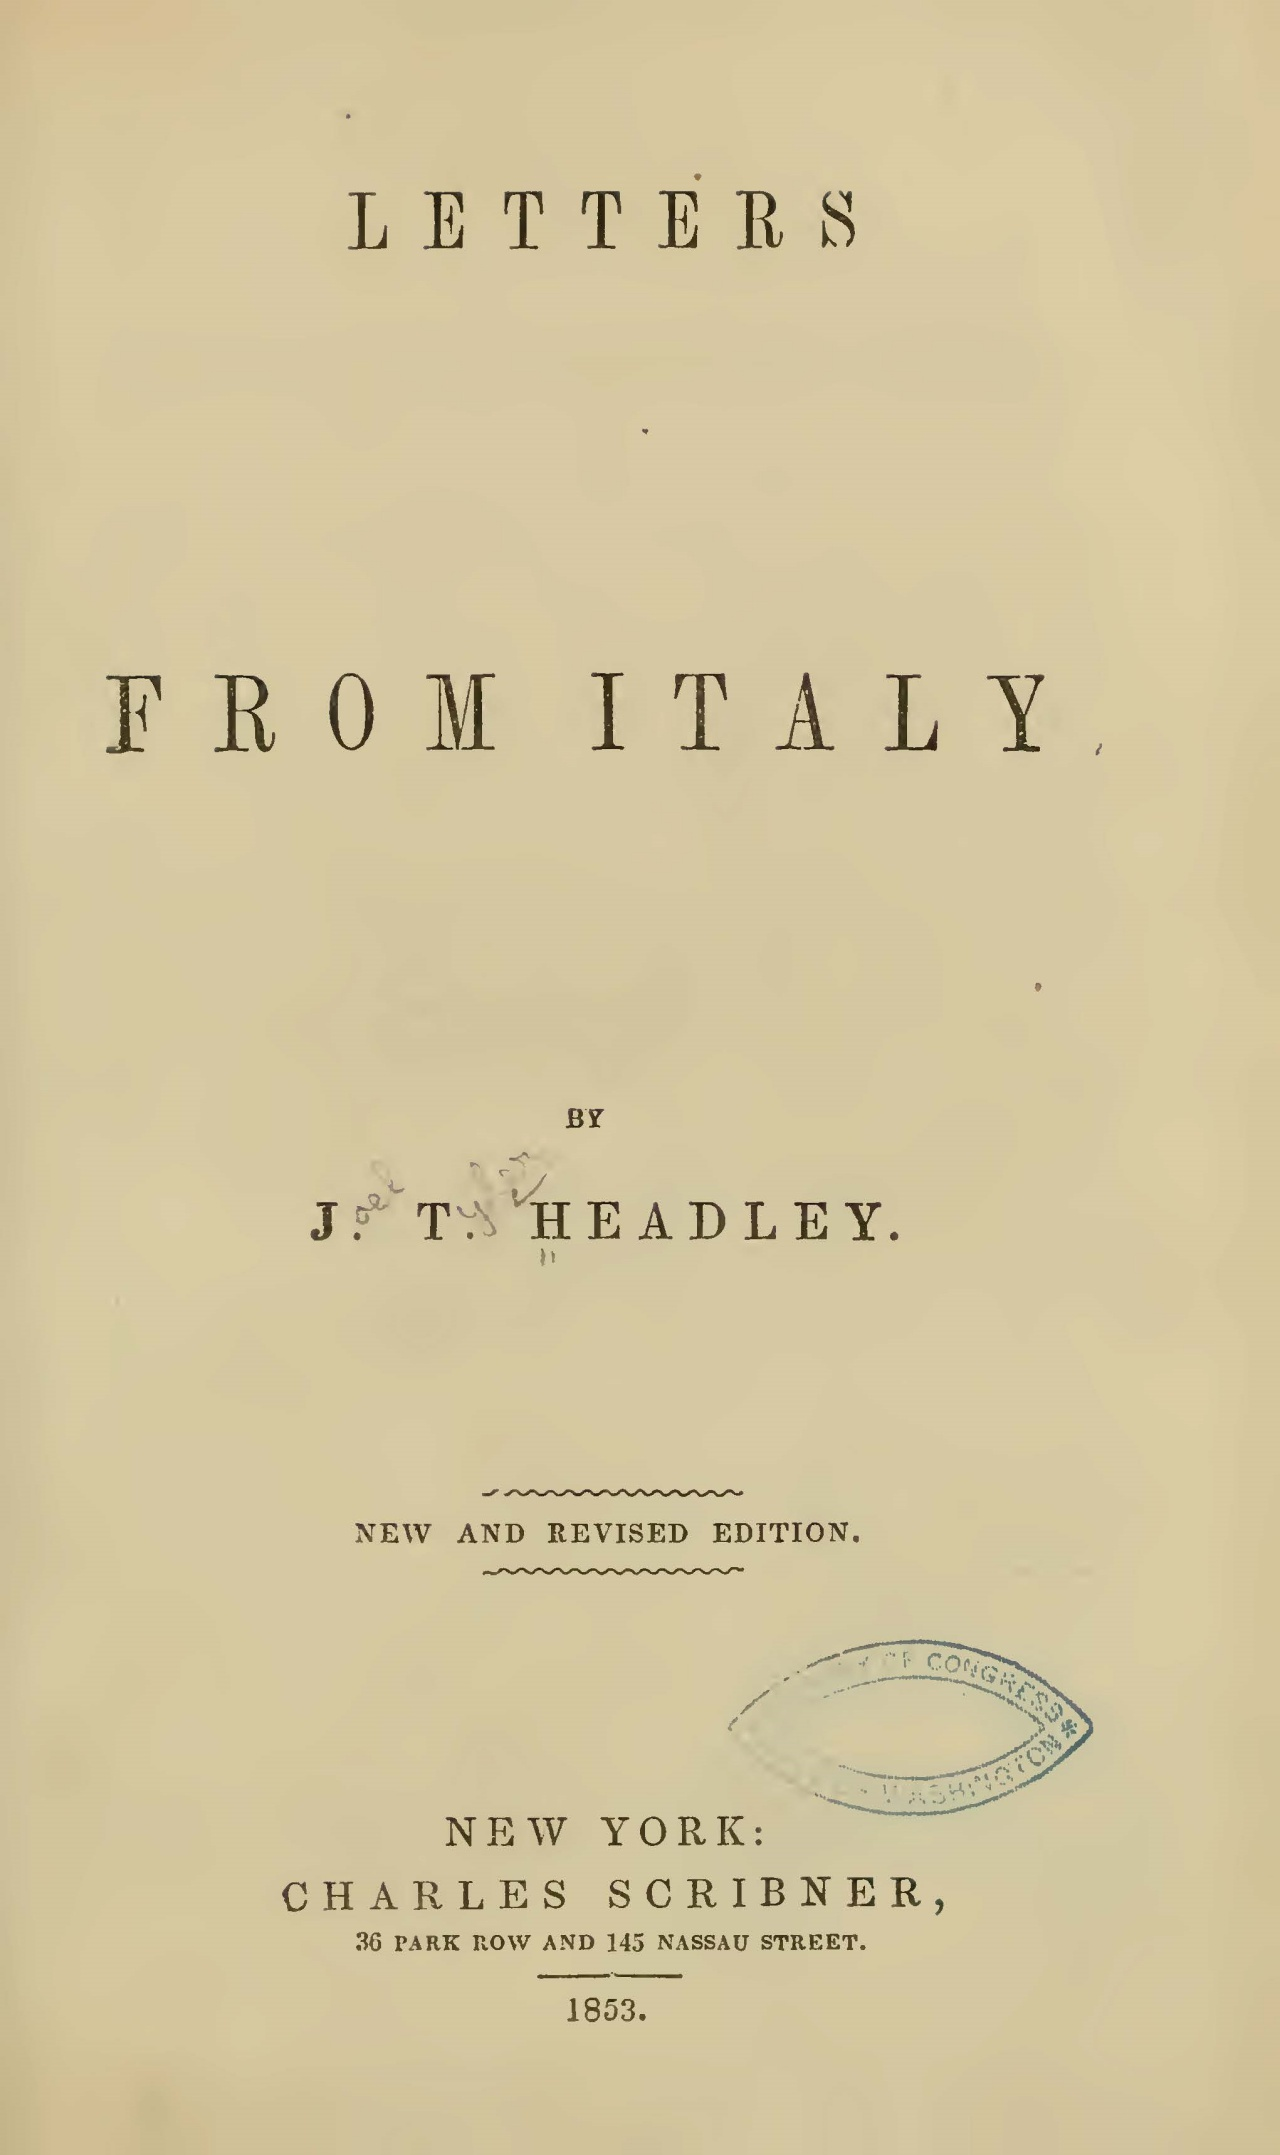 Headley, Joel Tyler, Letters from Italy Title Page.jpg